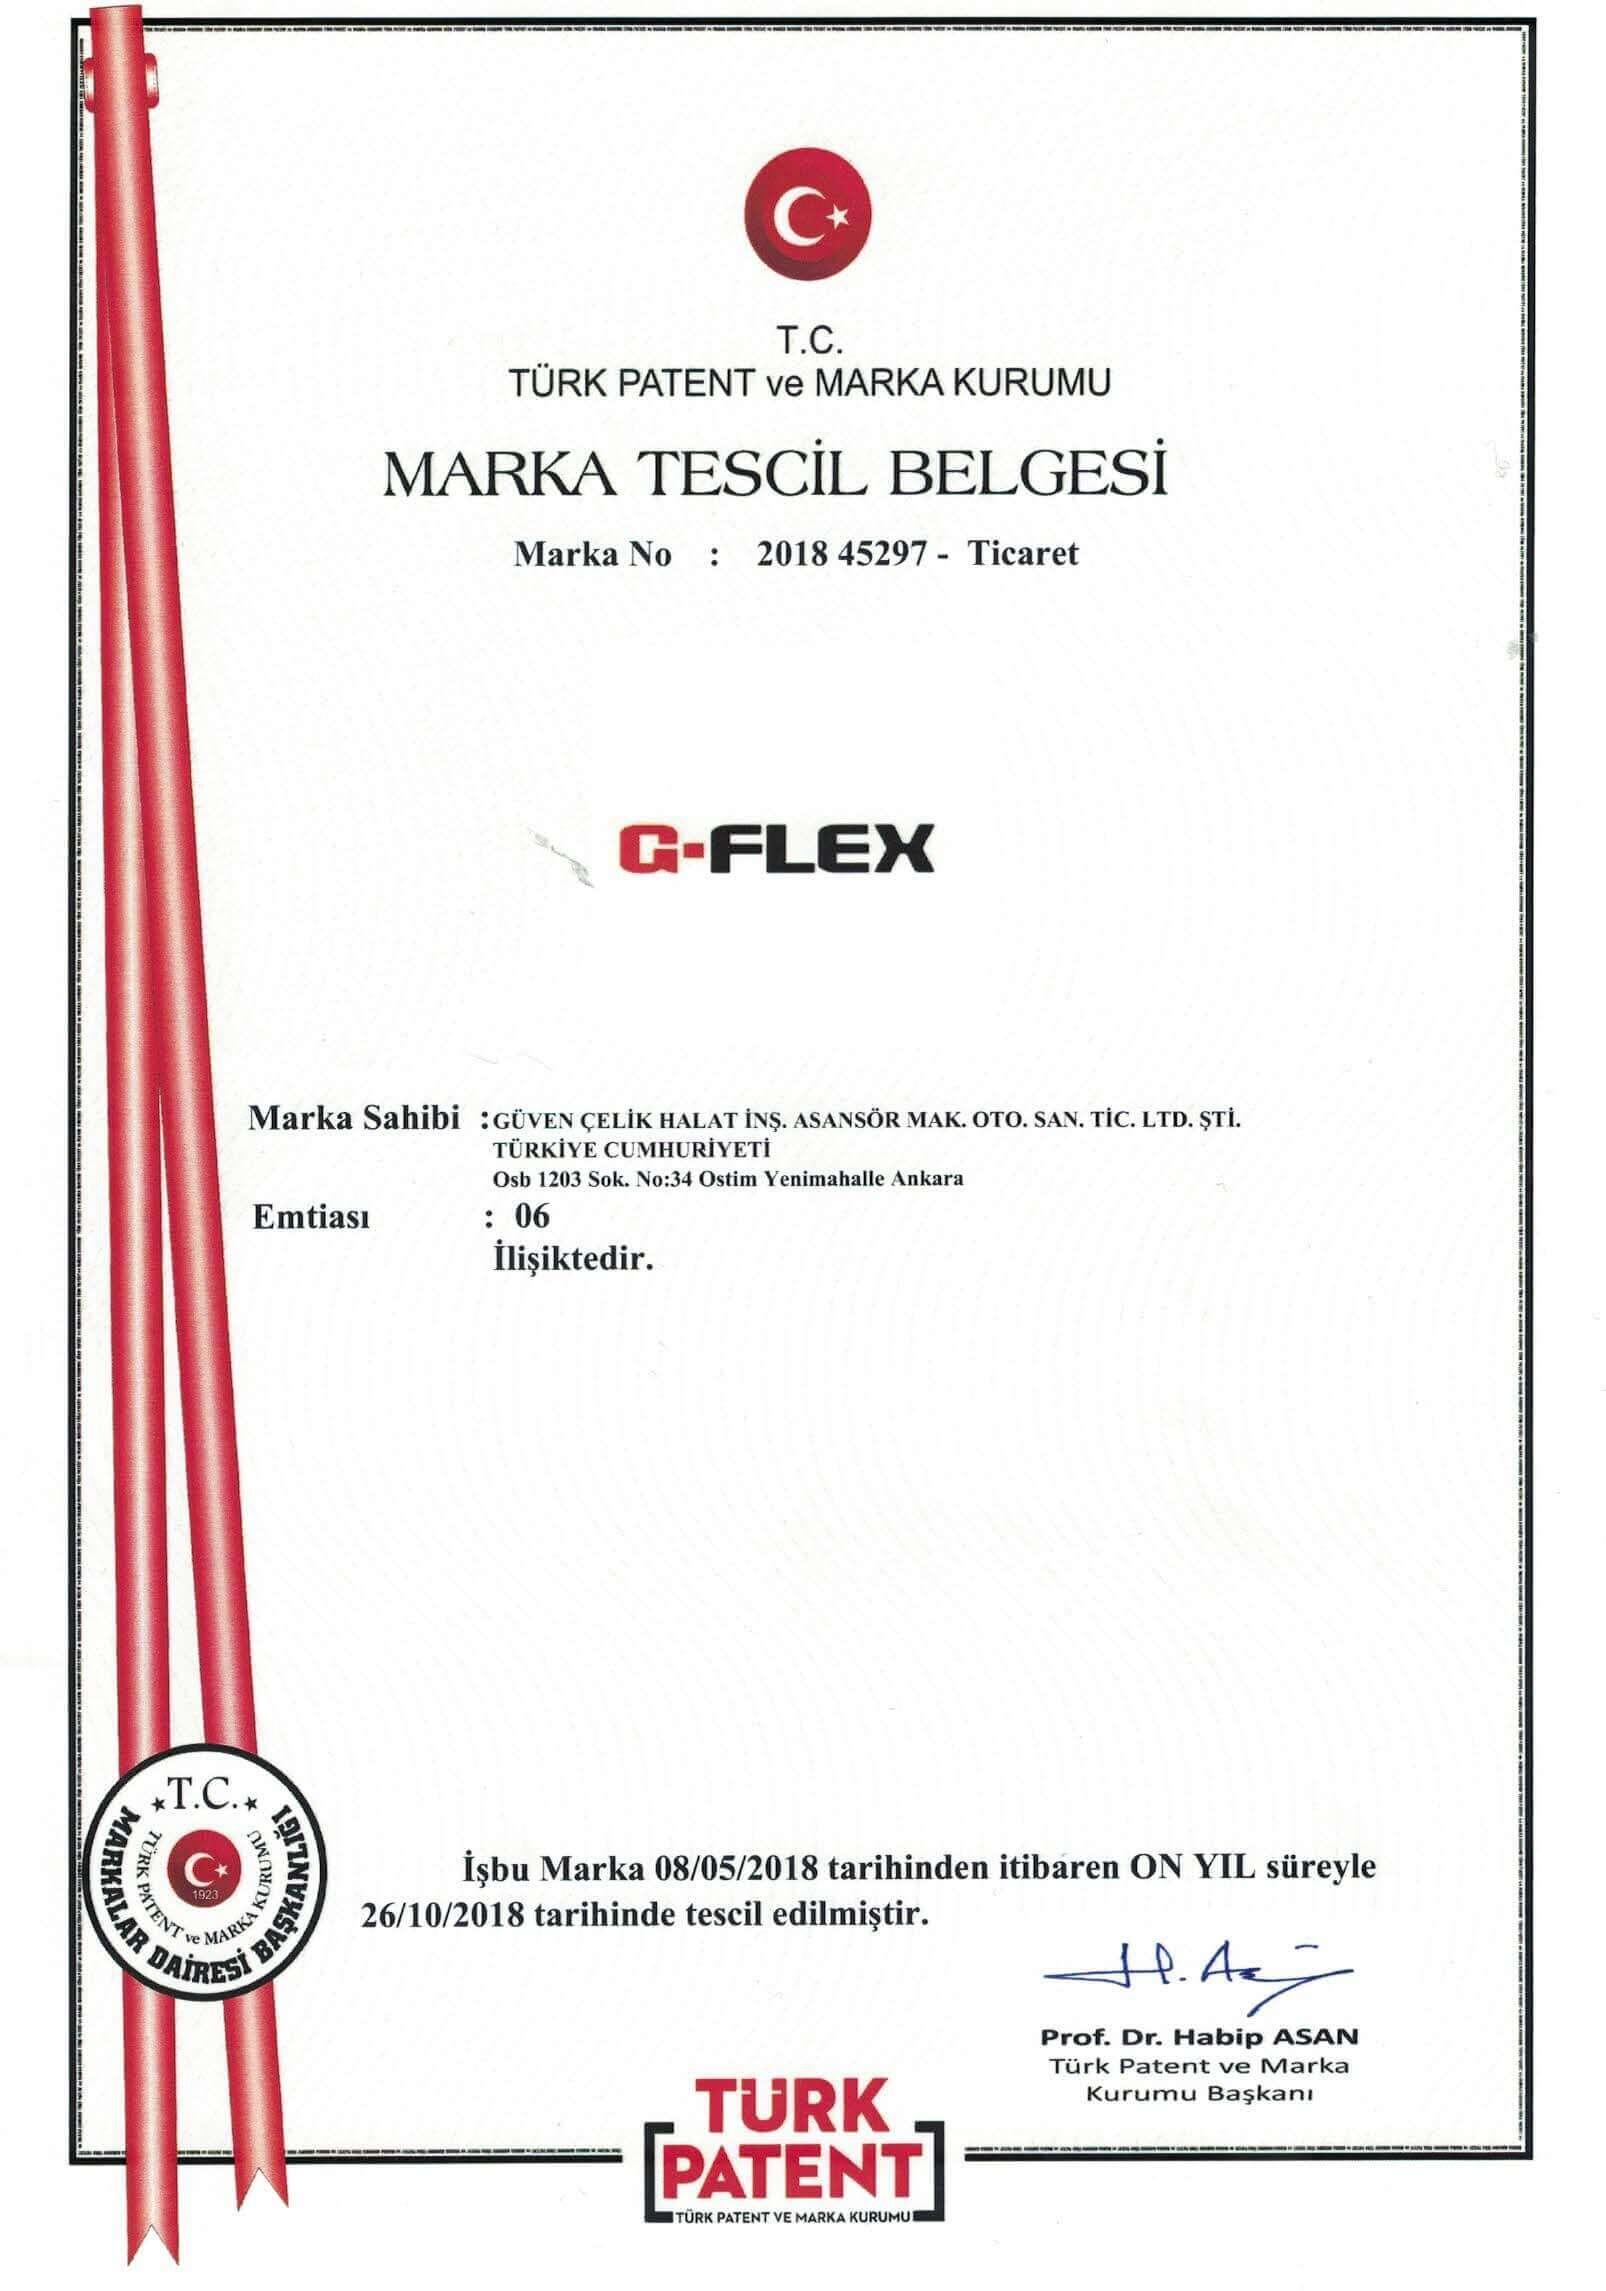 Marka Tescil Belgesi 1